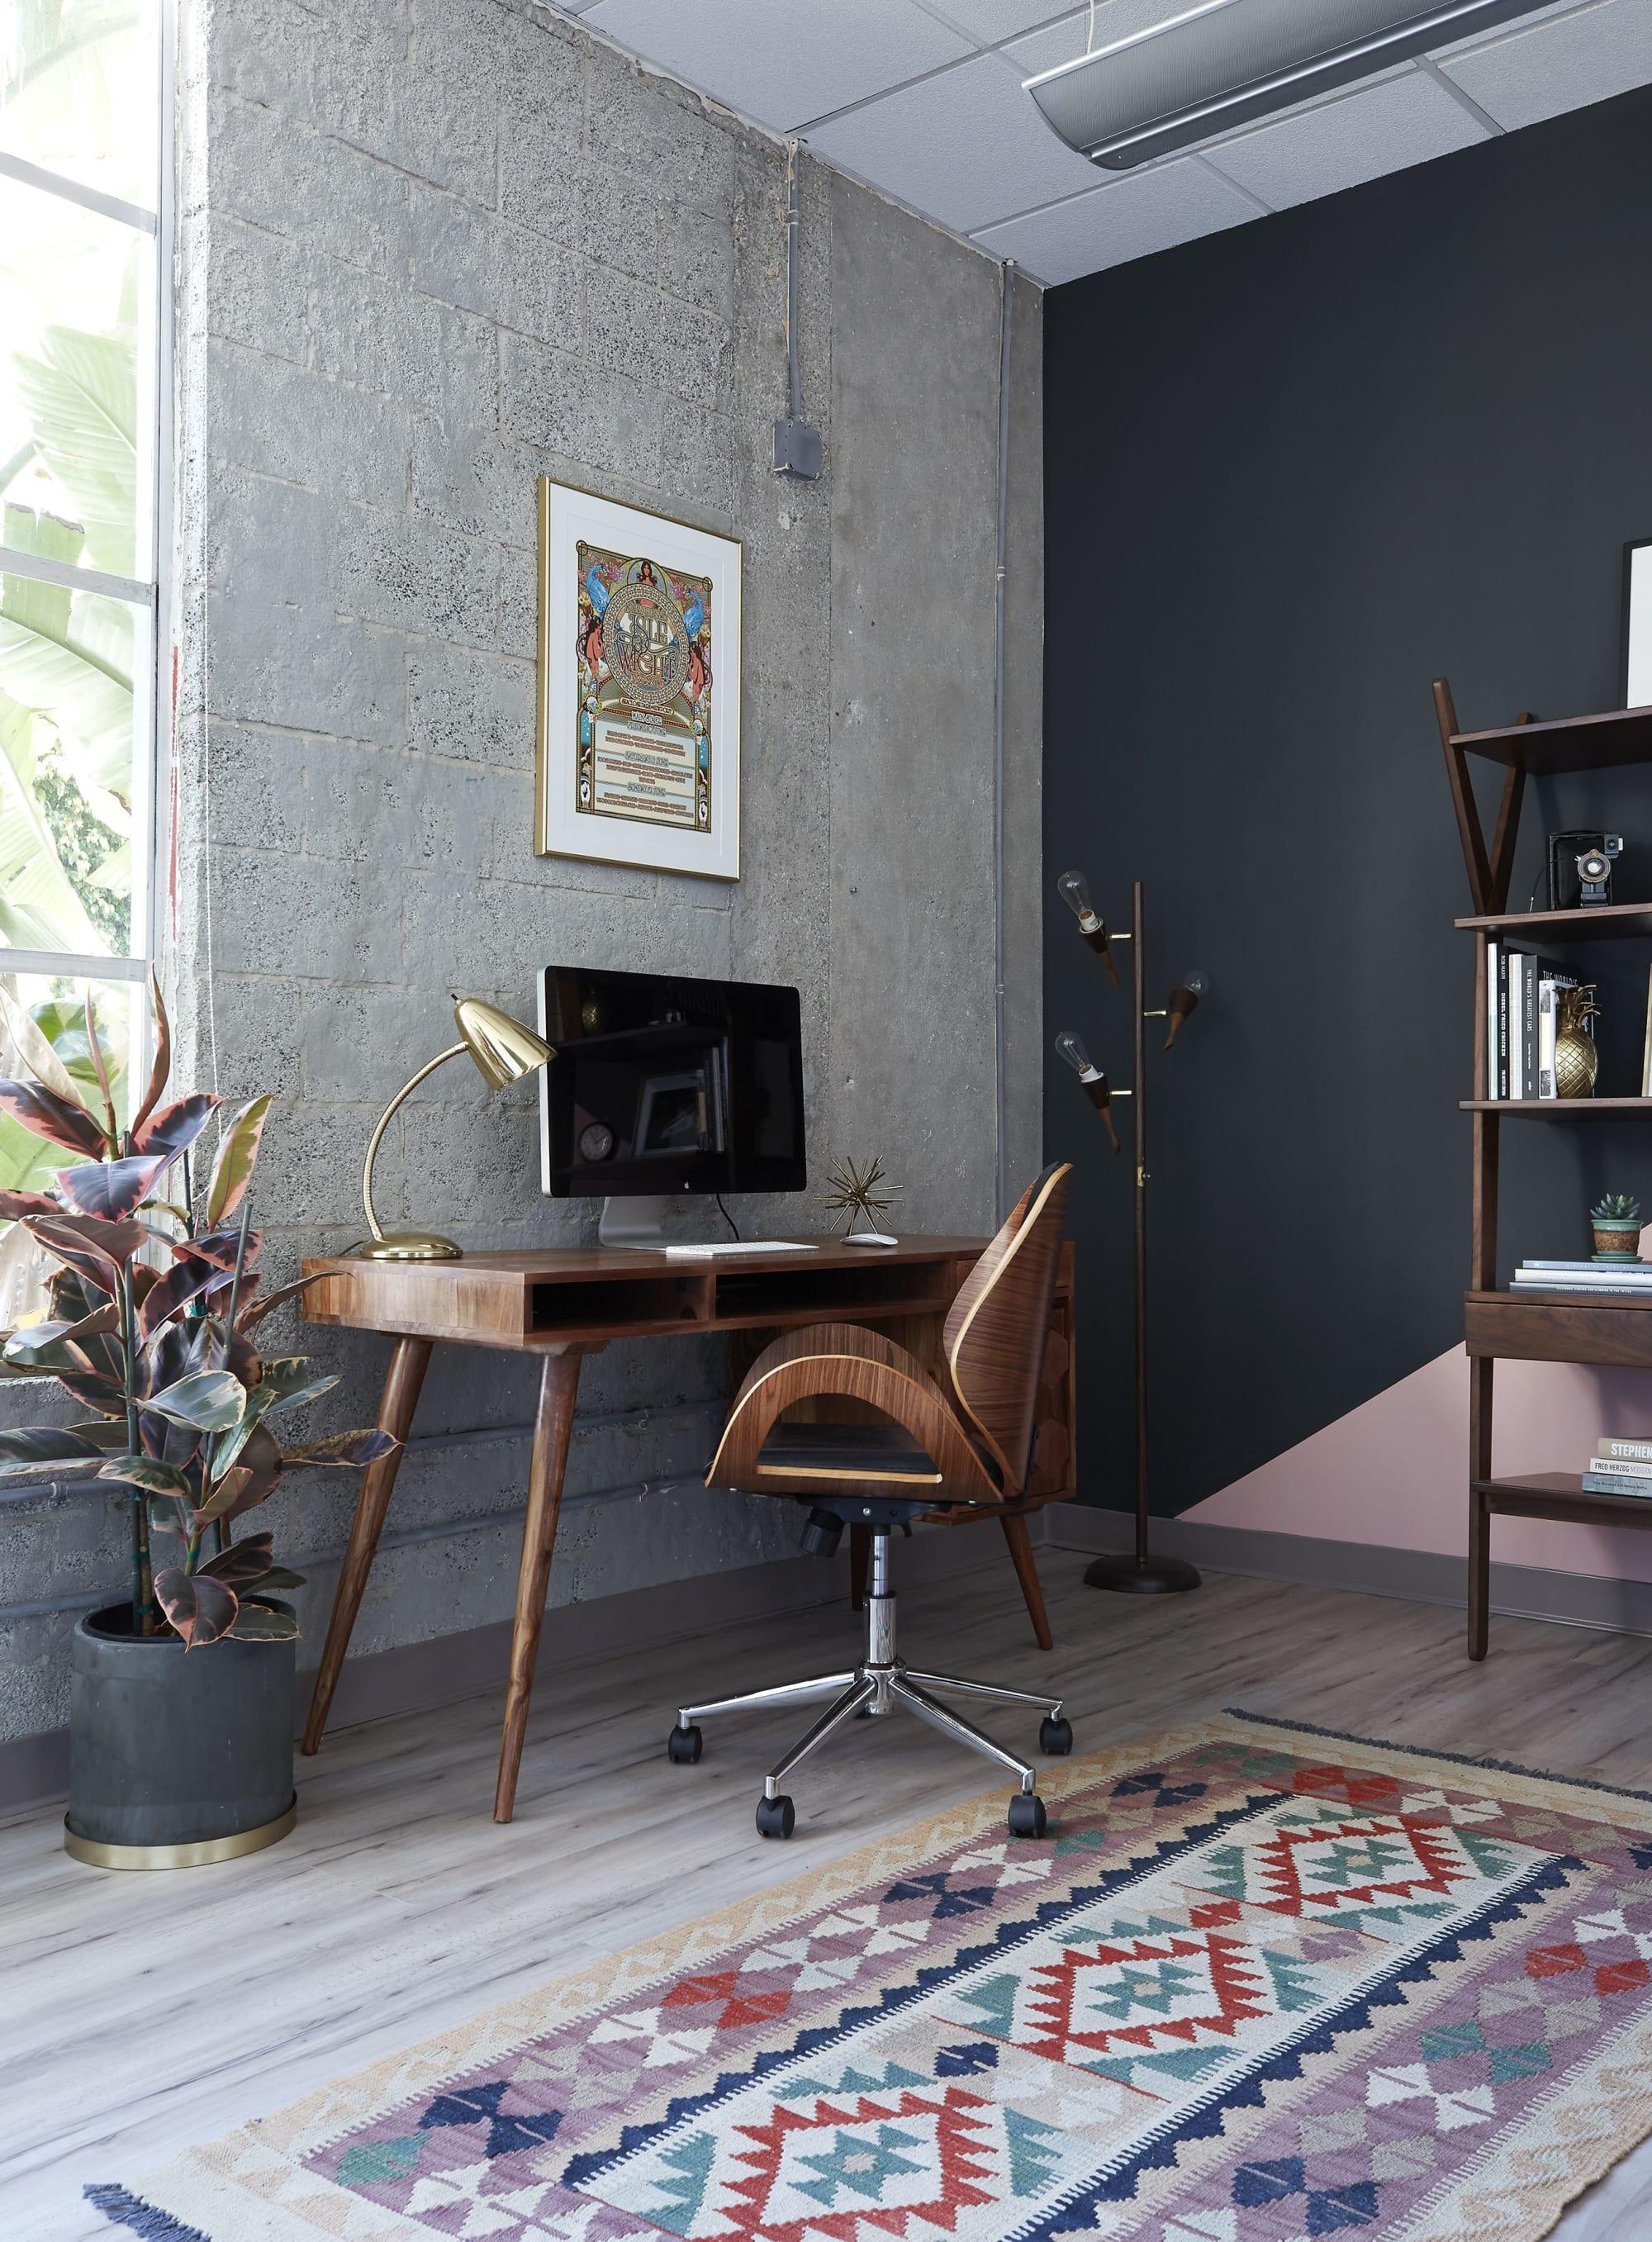 Interior Design by Popix Designs seen at EVO Films, Marina del Rey - Evo Films Offices